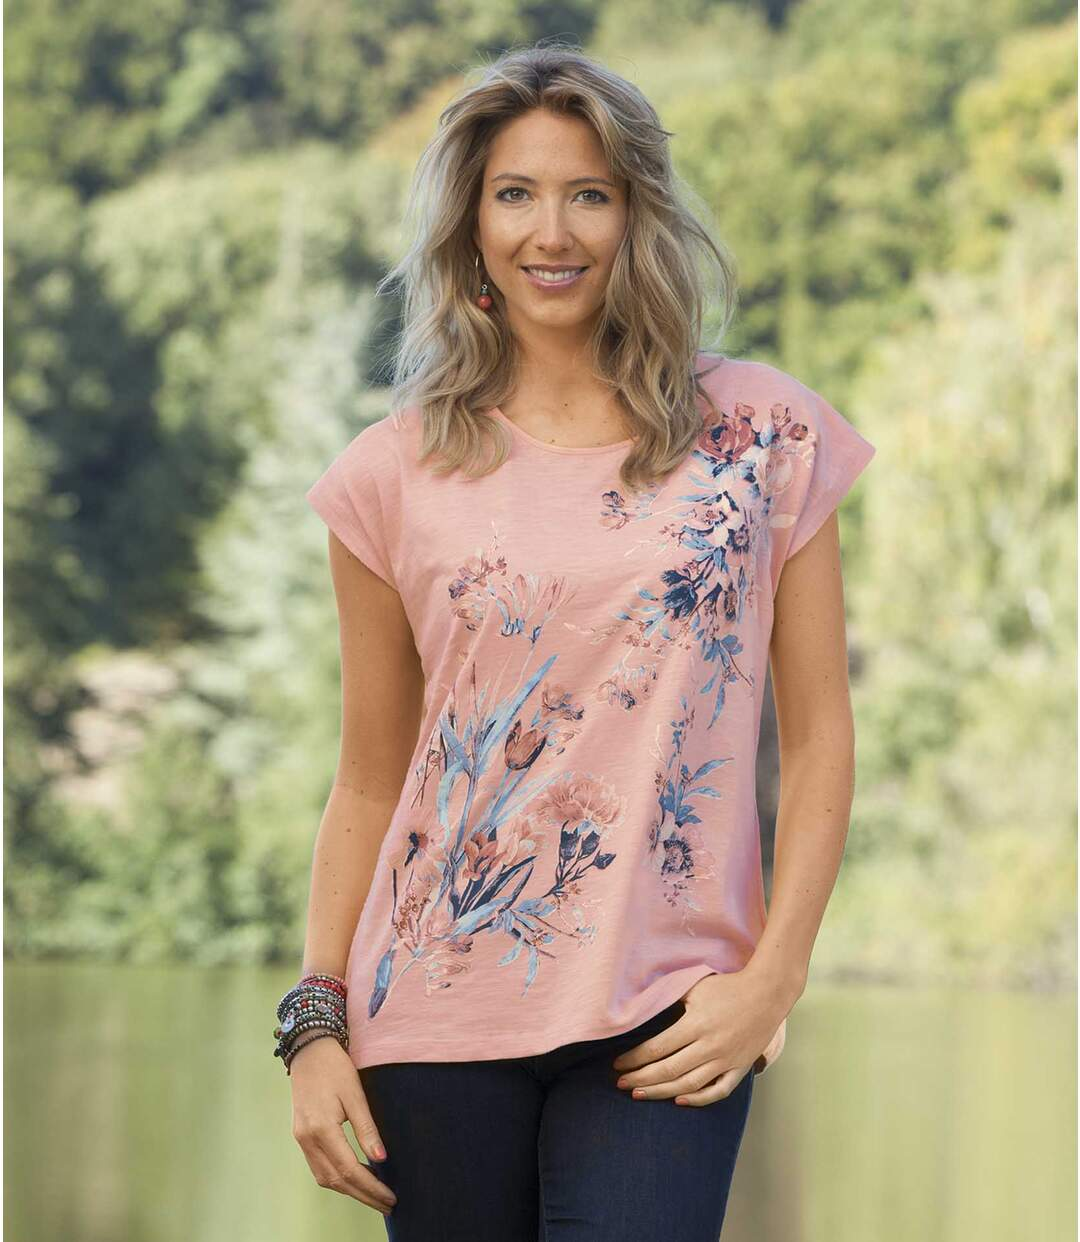 Women's Floral Short Sleeve T-Shirt - Peach Atlas For Men